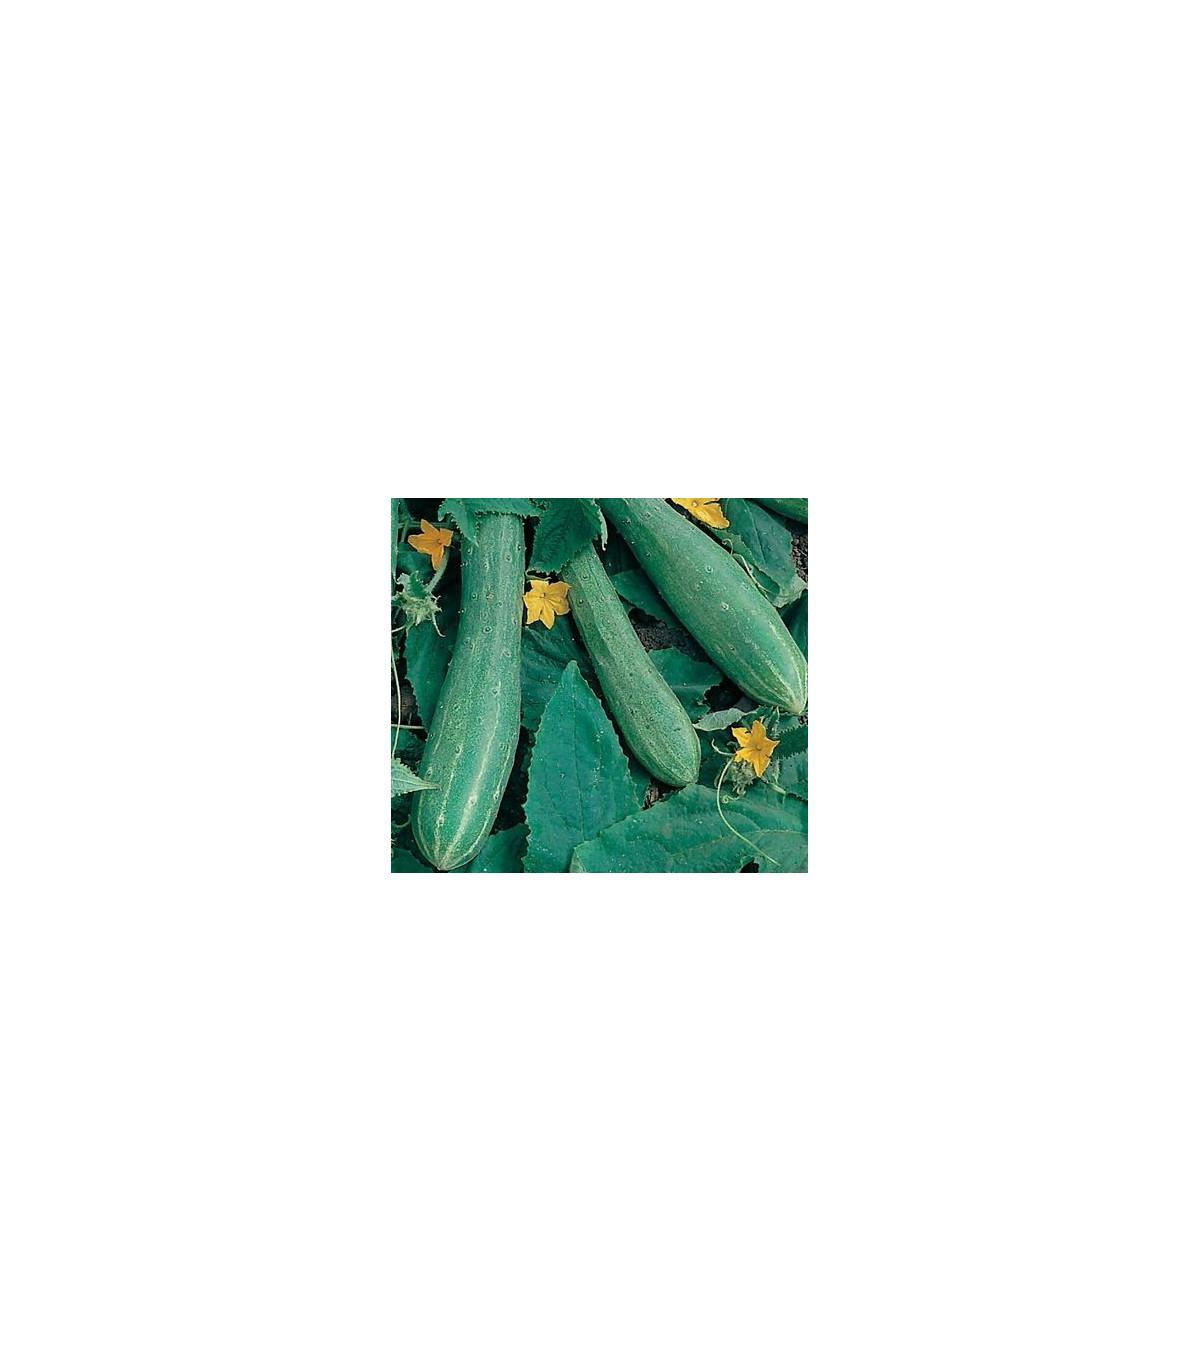 Salátová okurka - Cucumis sativus - semínka okurek - 25 ks